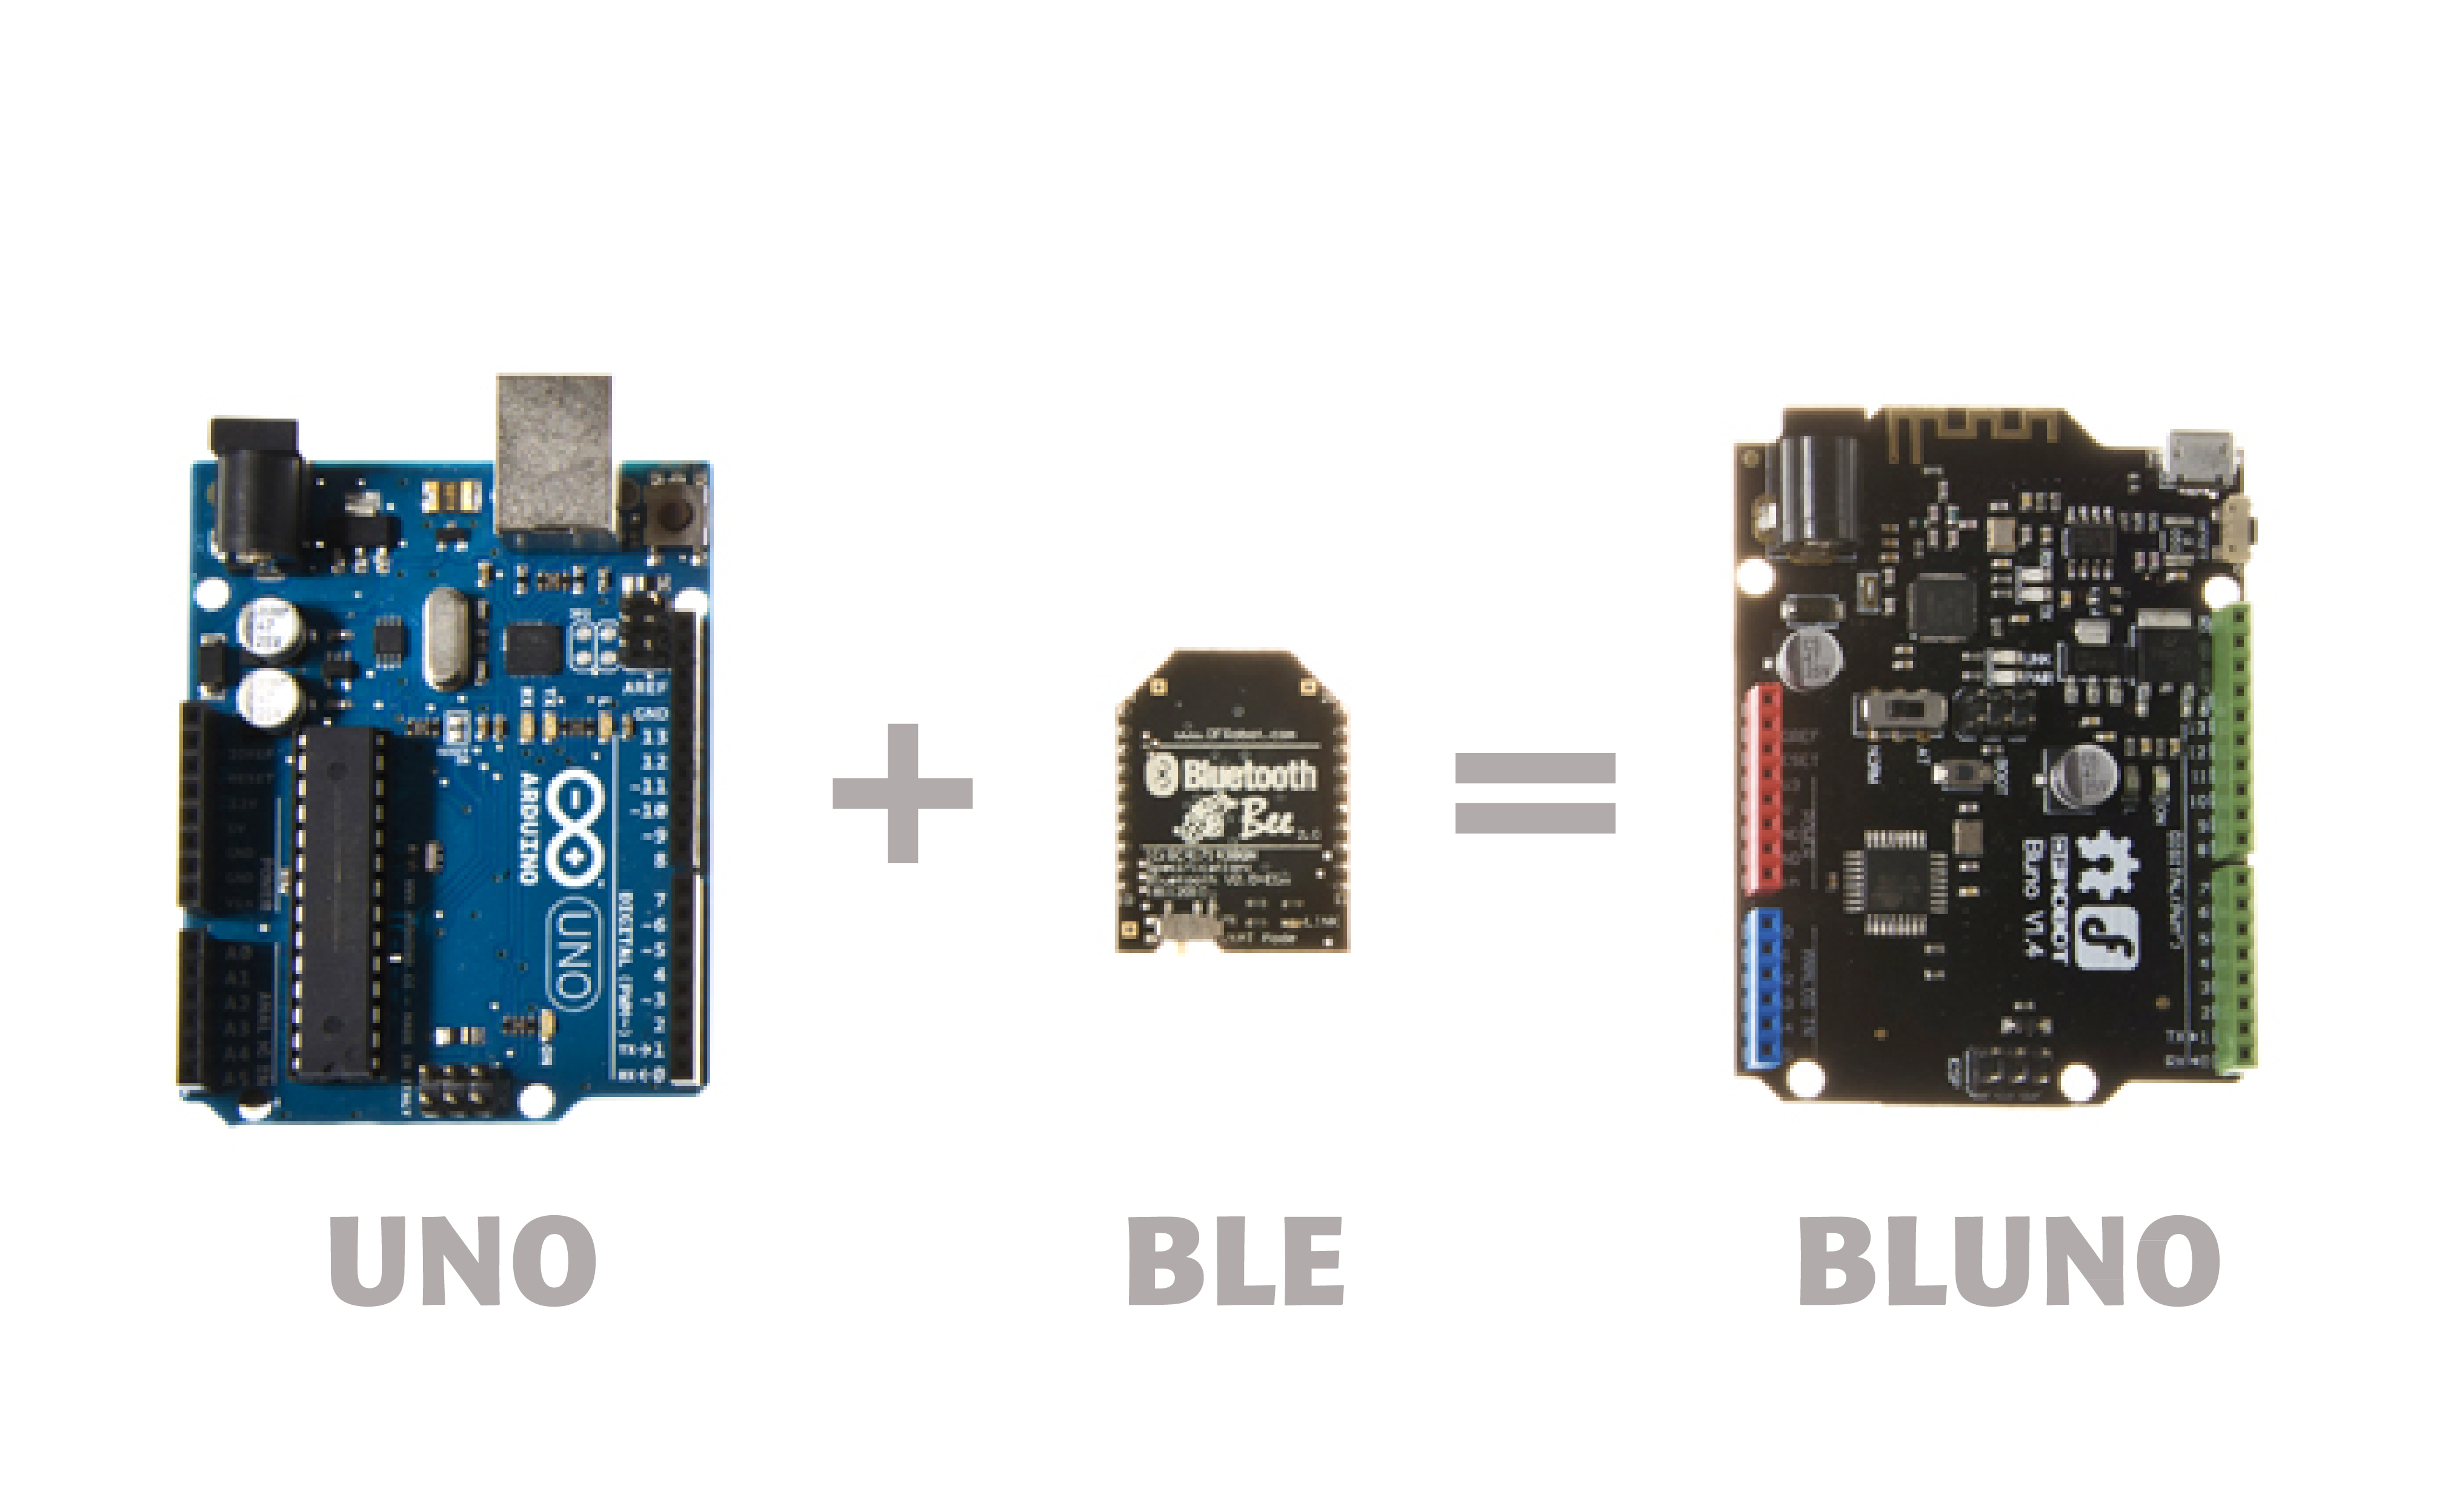 Bluno是集成蓝牙4.0的Arduino UNO控制器